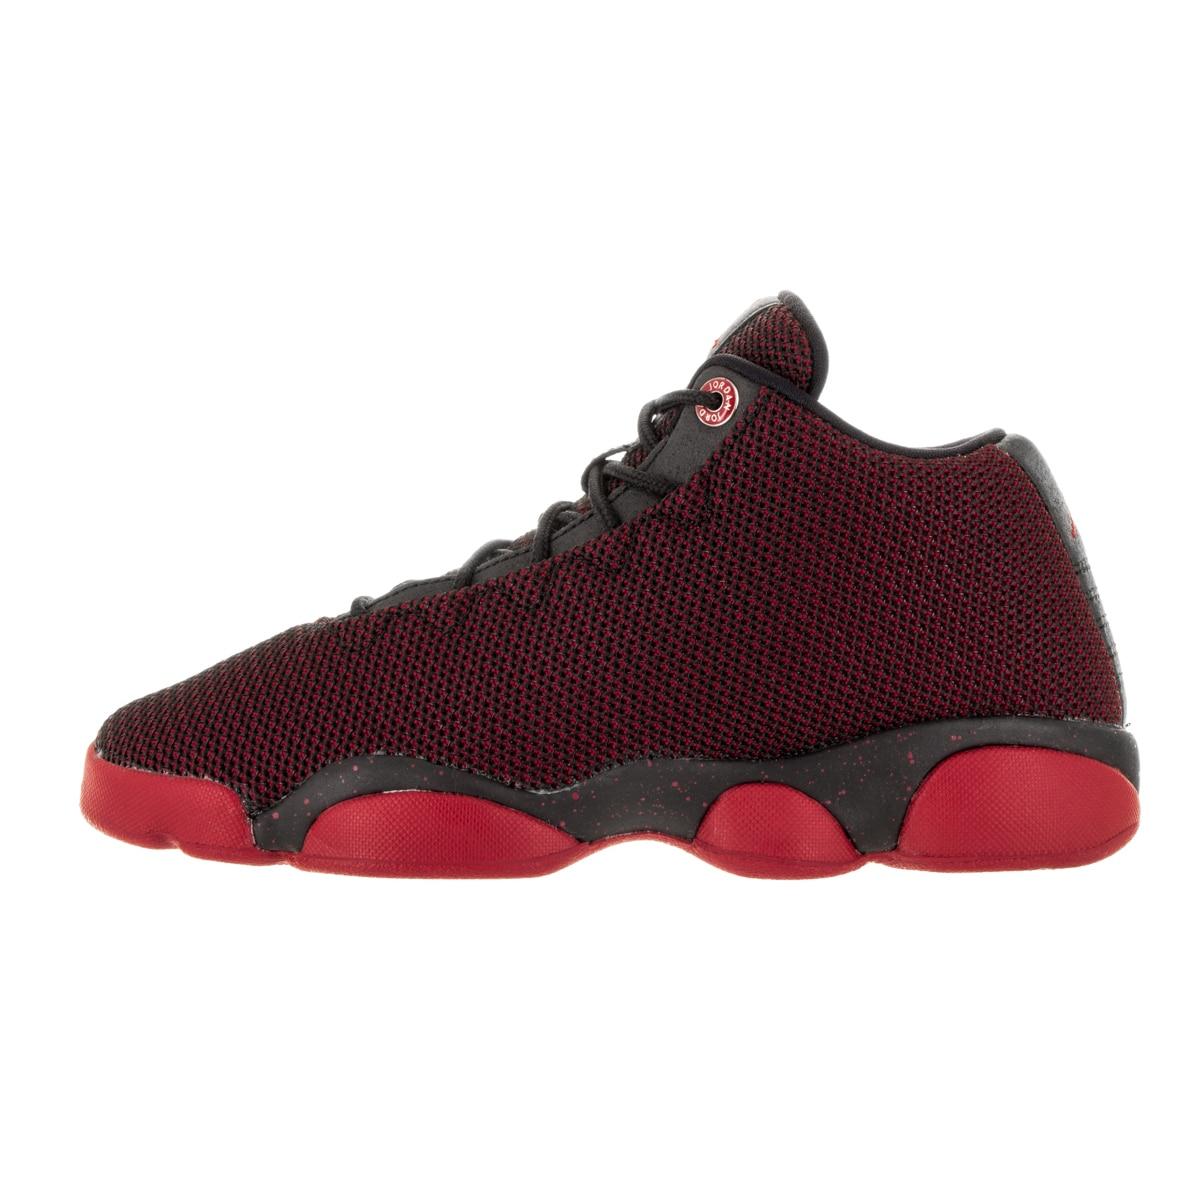 5d95549ecabf21 Shop Nike Kids Jordan Horizon Low Black Gym Red White Textile Basketball  Shoes - Free Shipping Today - Overstock - 13394435